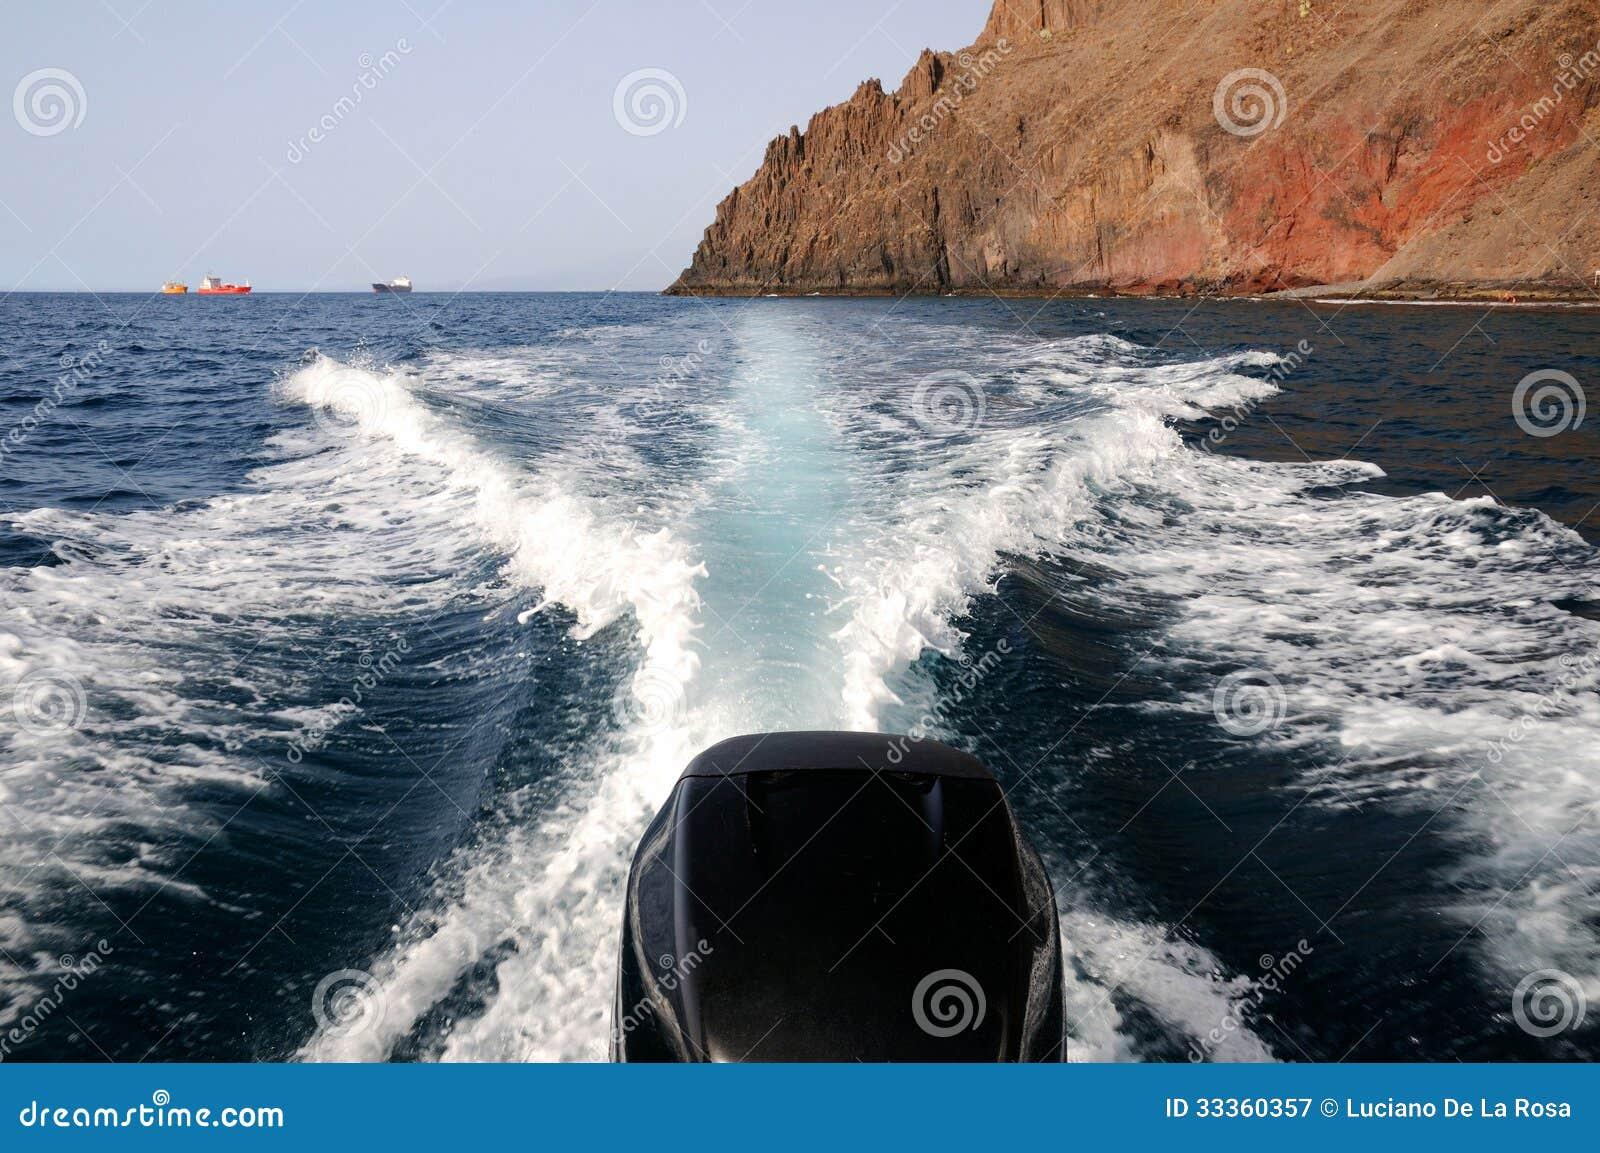 Sailing the blue sea on a boat outboard